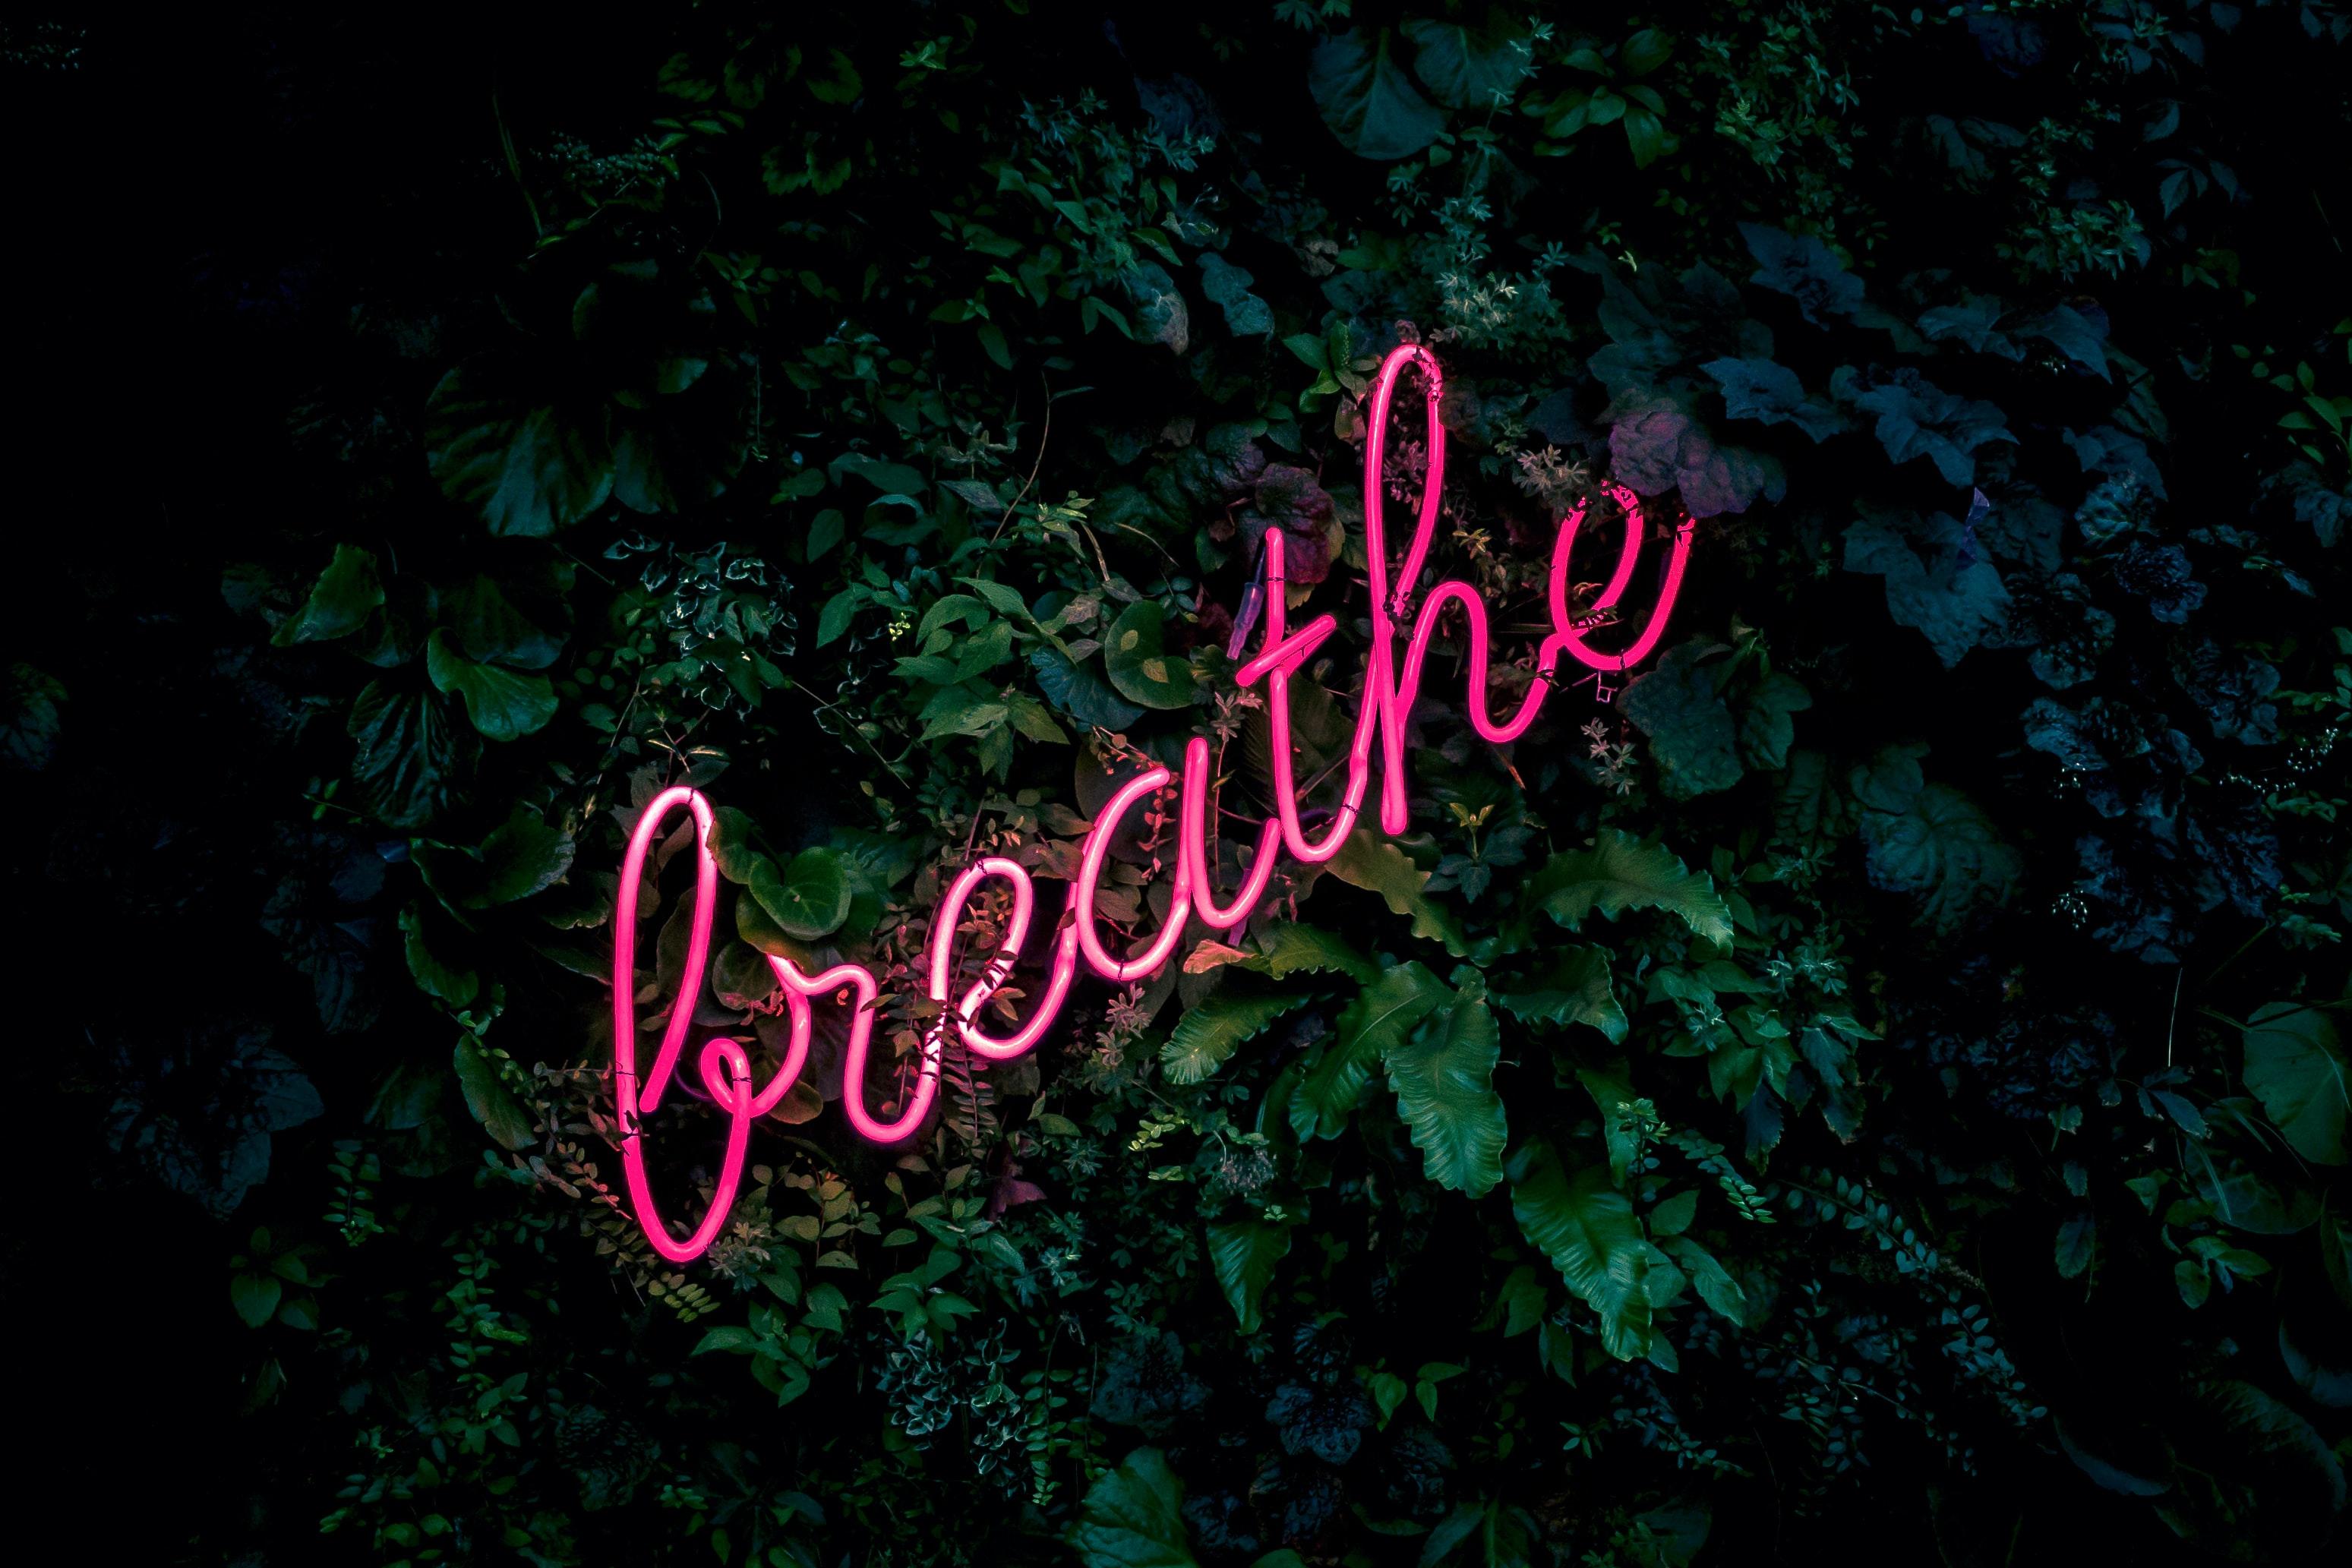 Image by Fabian Moller, via Unsplash.com.